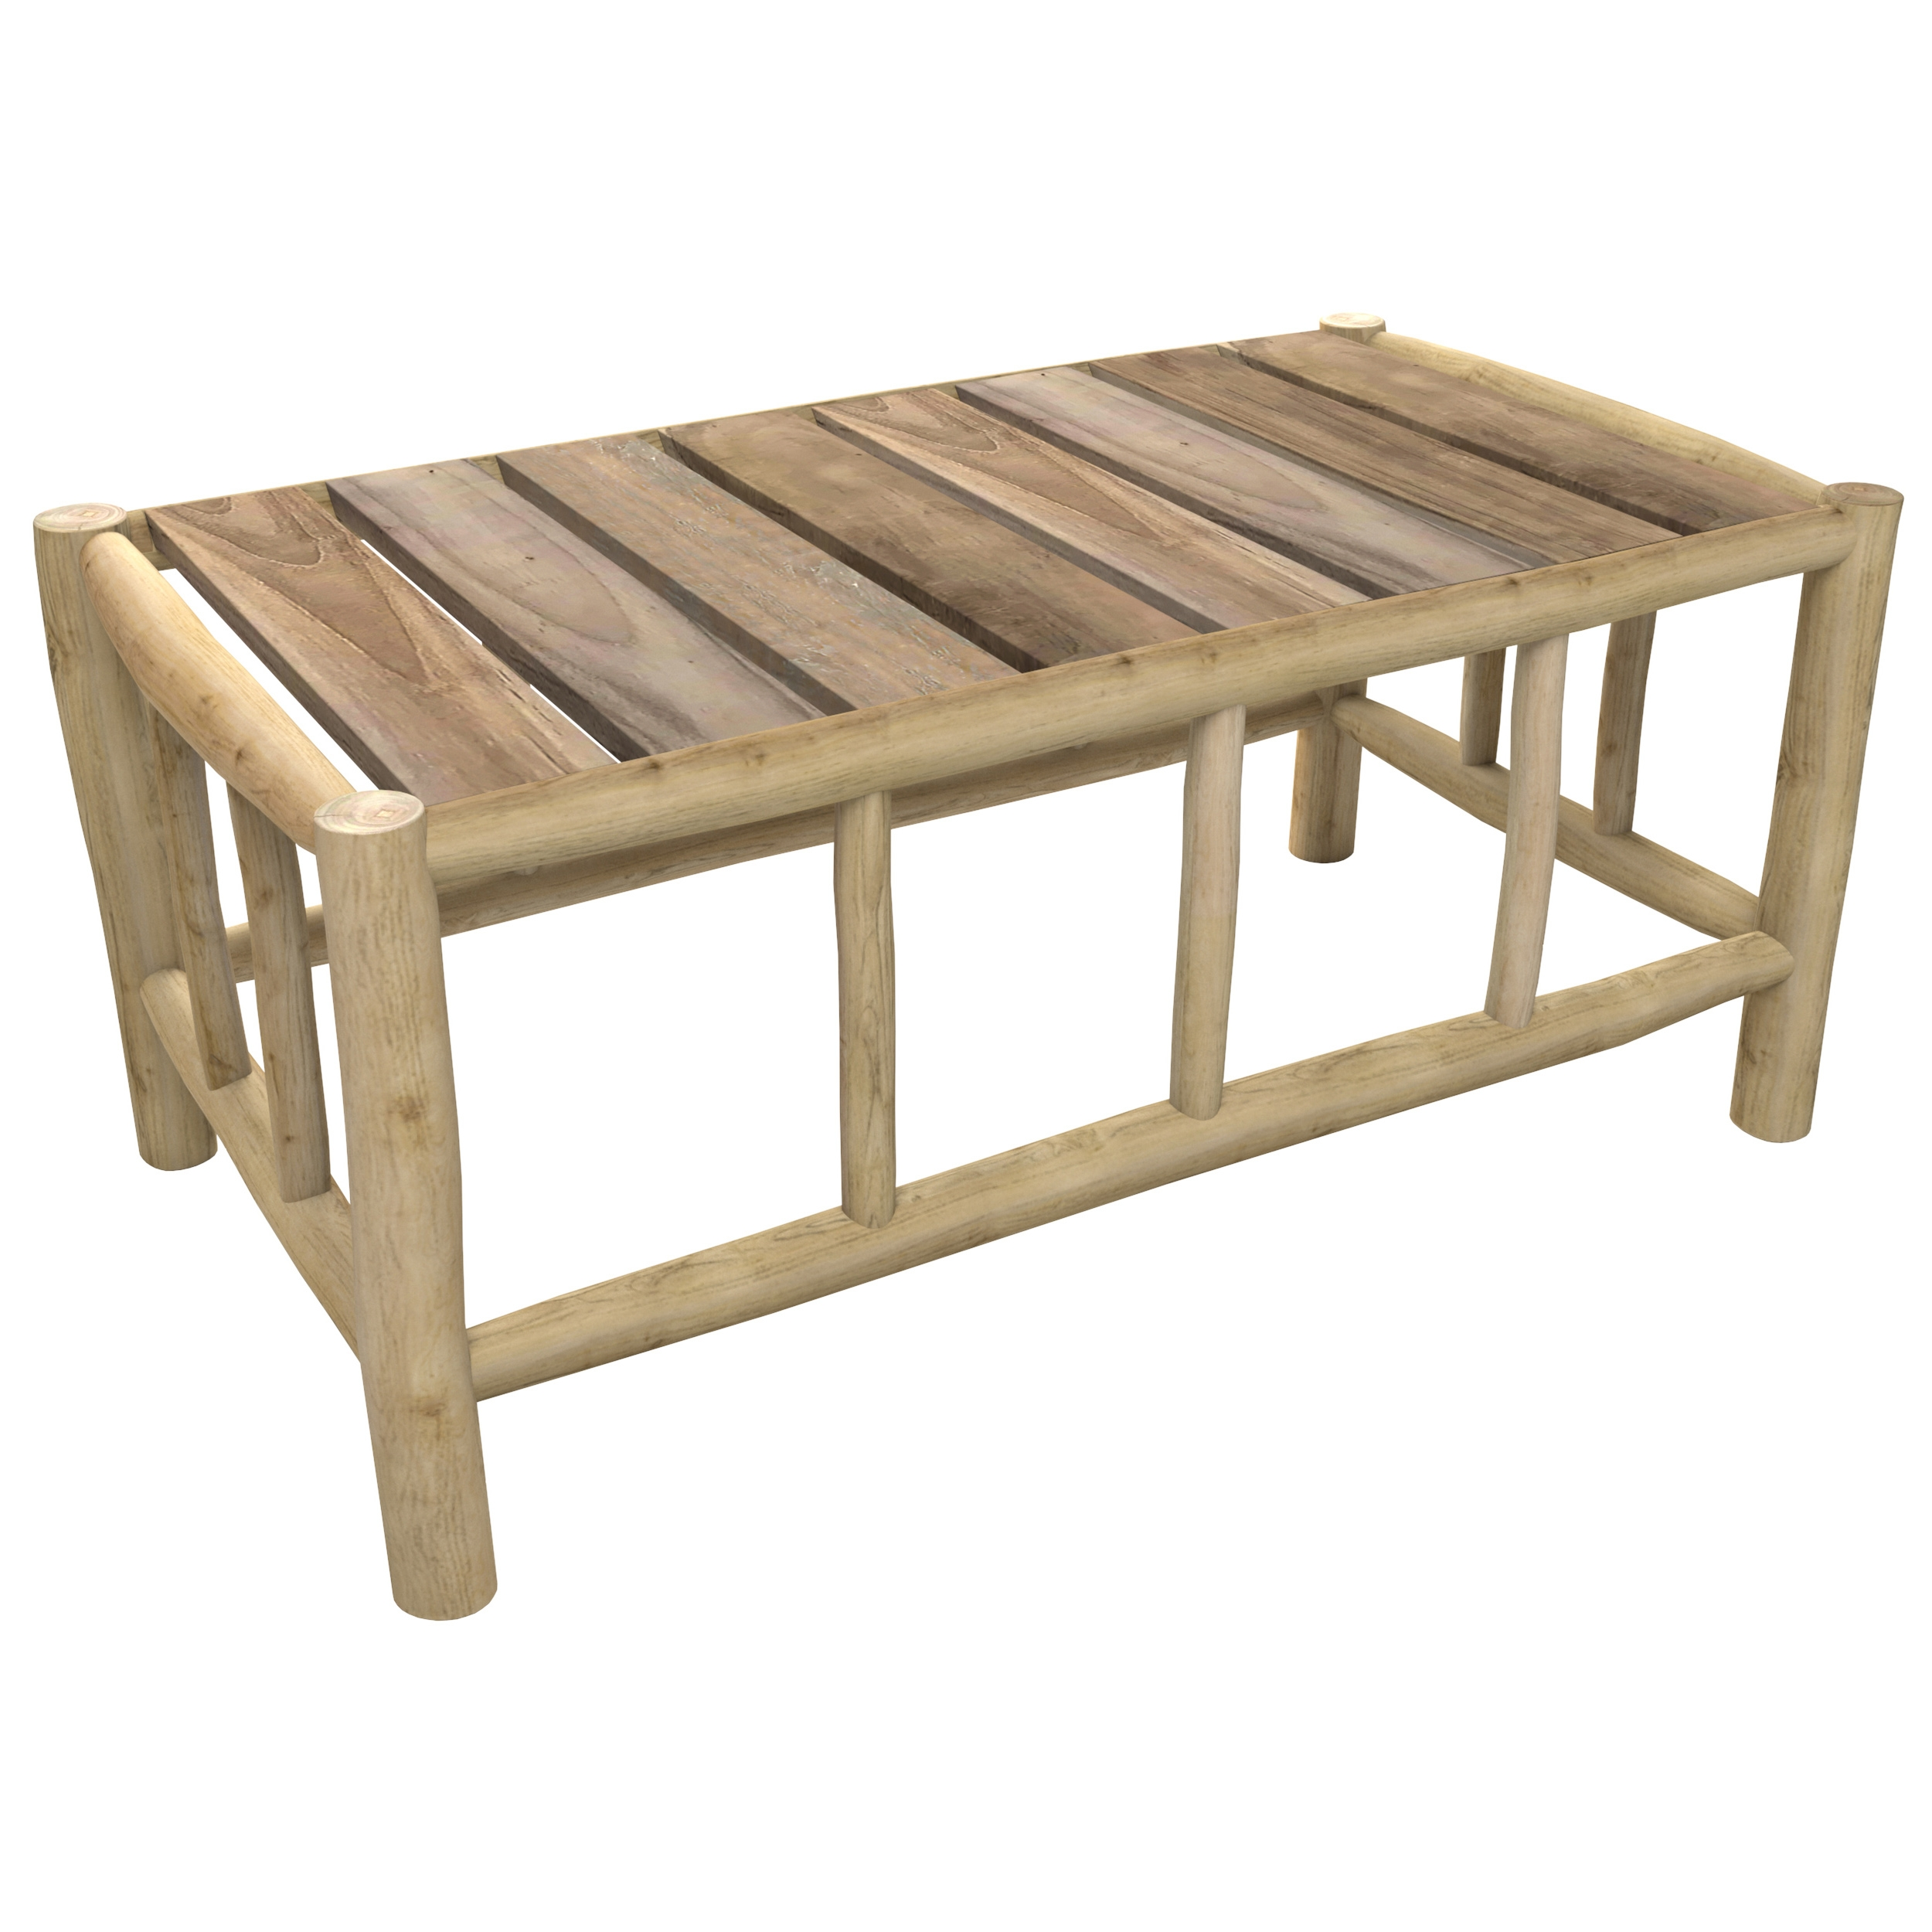 Table basse de jardin rectangulaire en teck